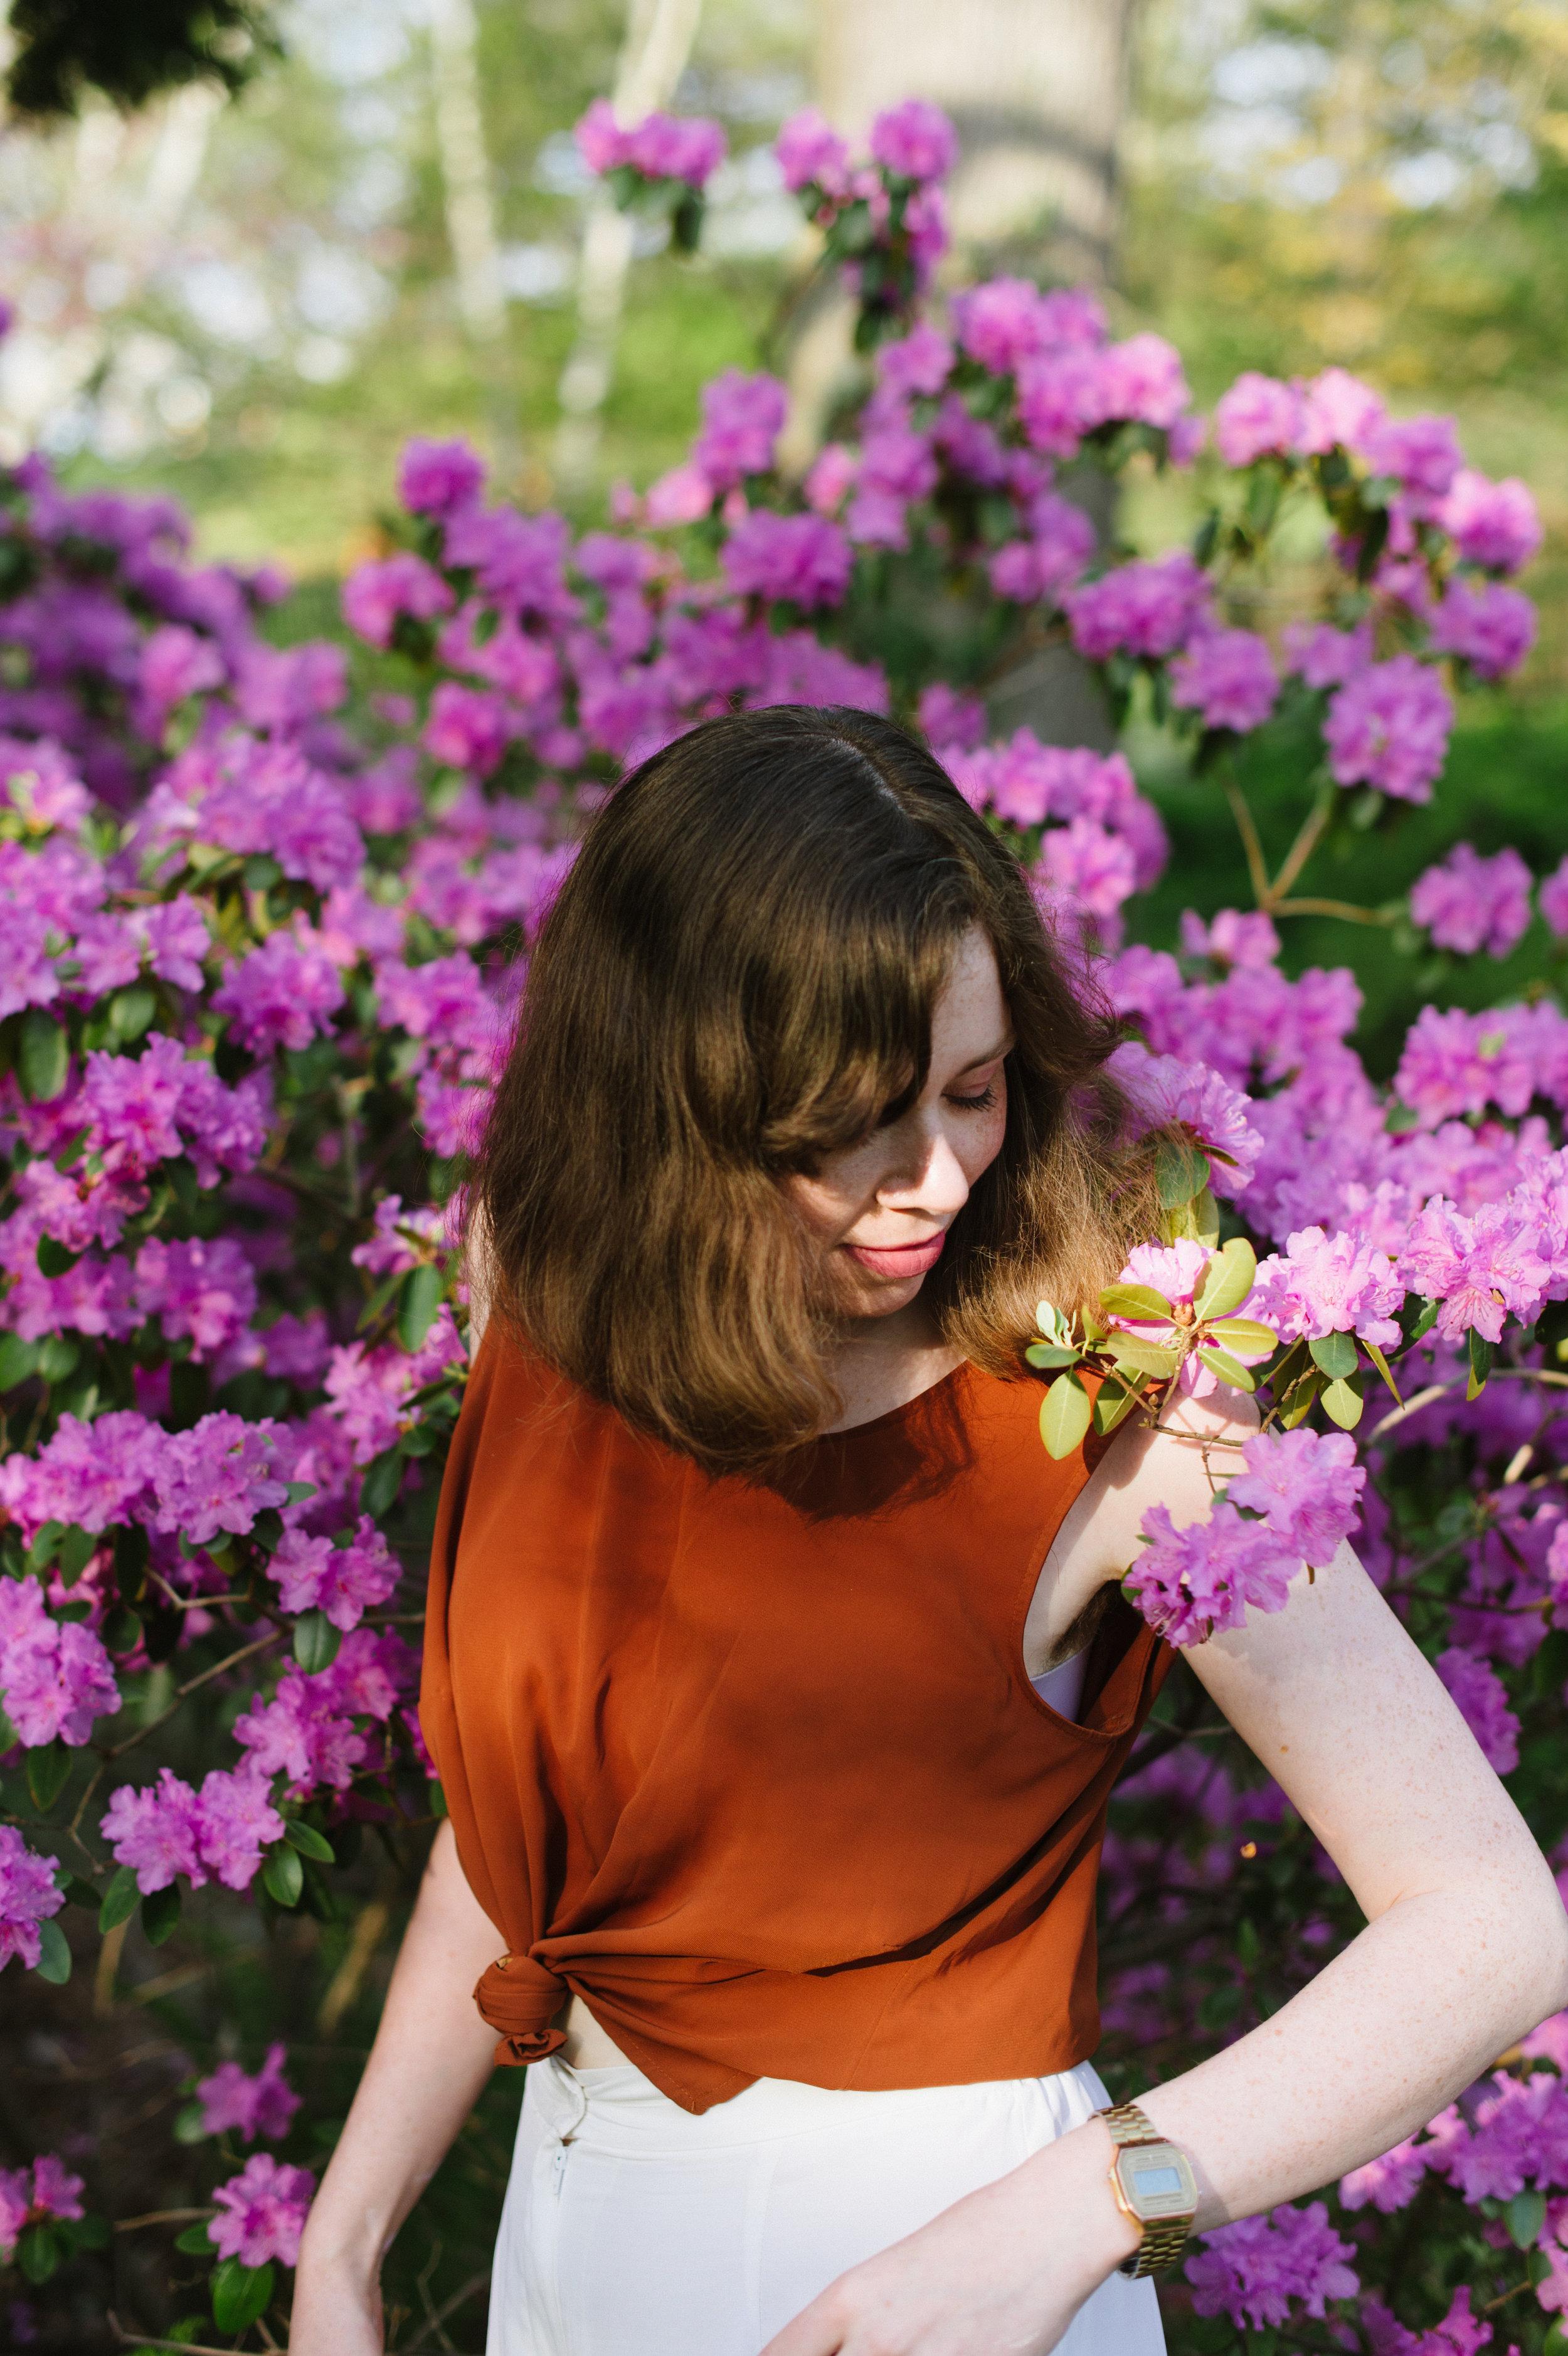 Celine-kim-photography-toronto-portrait-photographer-louise-reimer-2.jpg